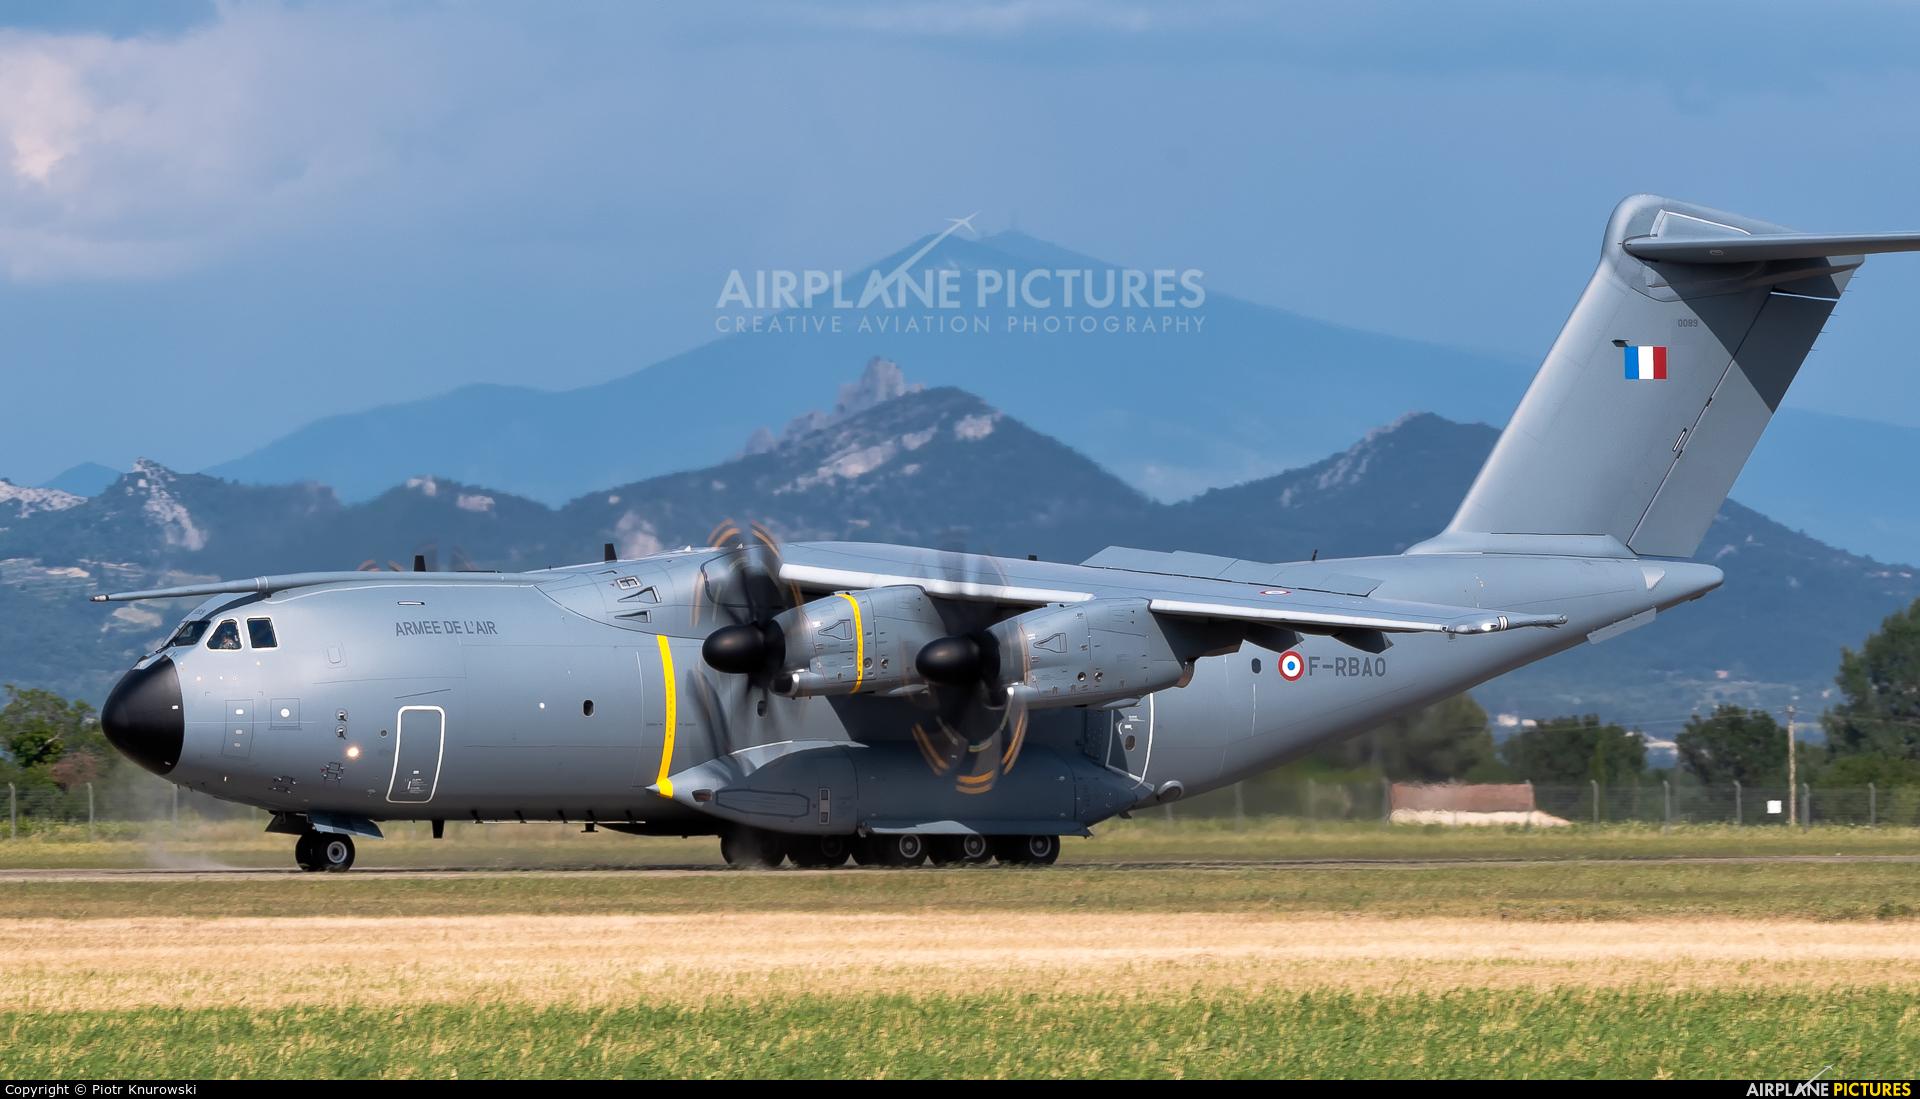 France - Air Force F-RBAO aircraft at Orange - Caritat